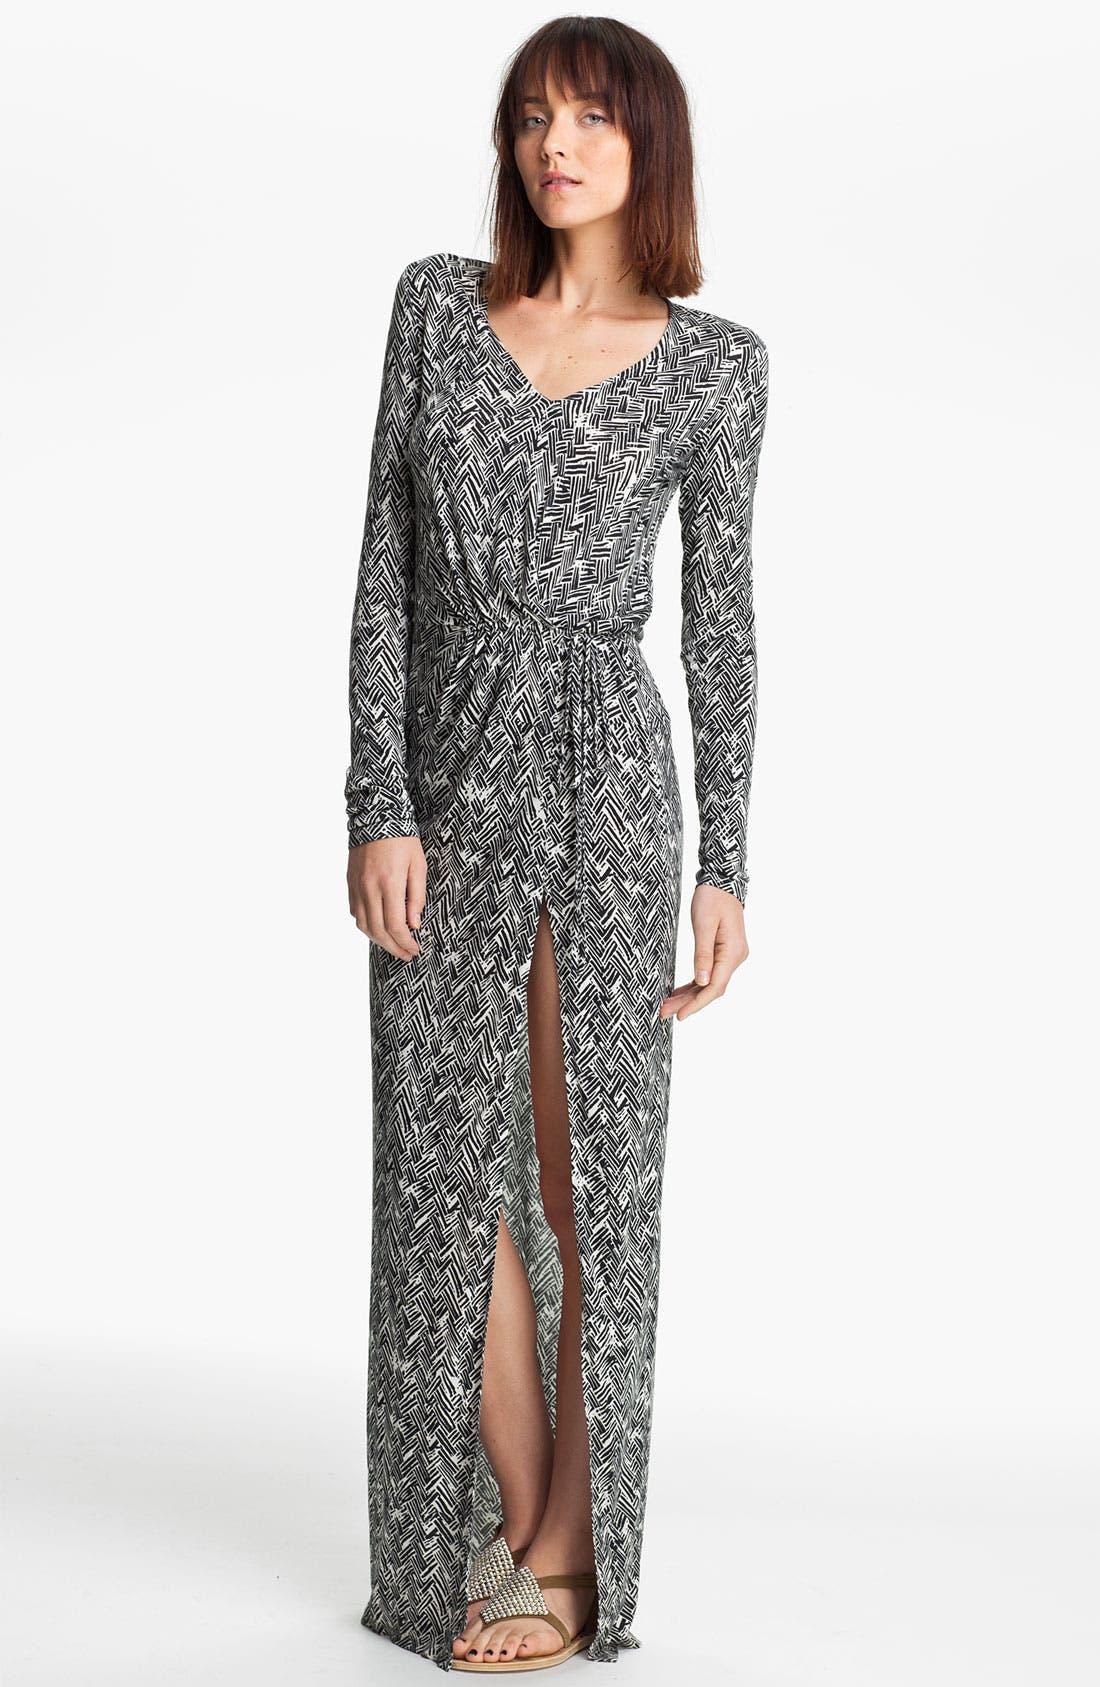 Alternate Image 1 Selected - Thakoon Carbon Copy Basket Weave Print Maxi Dress